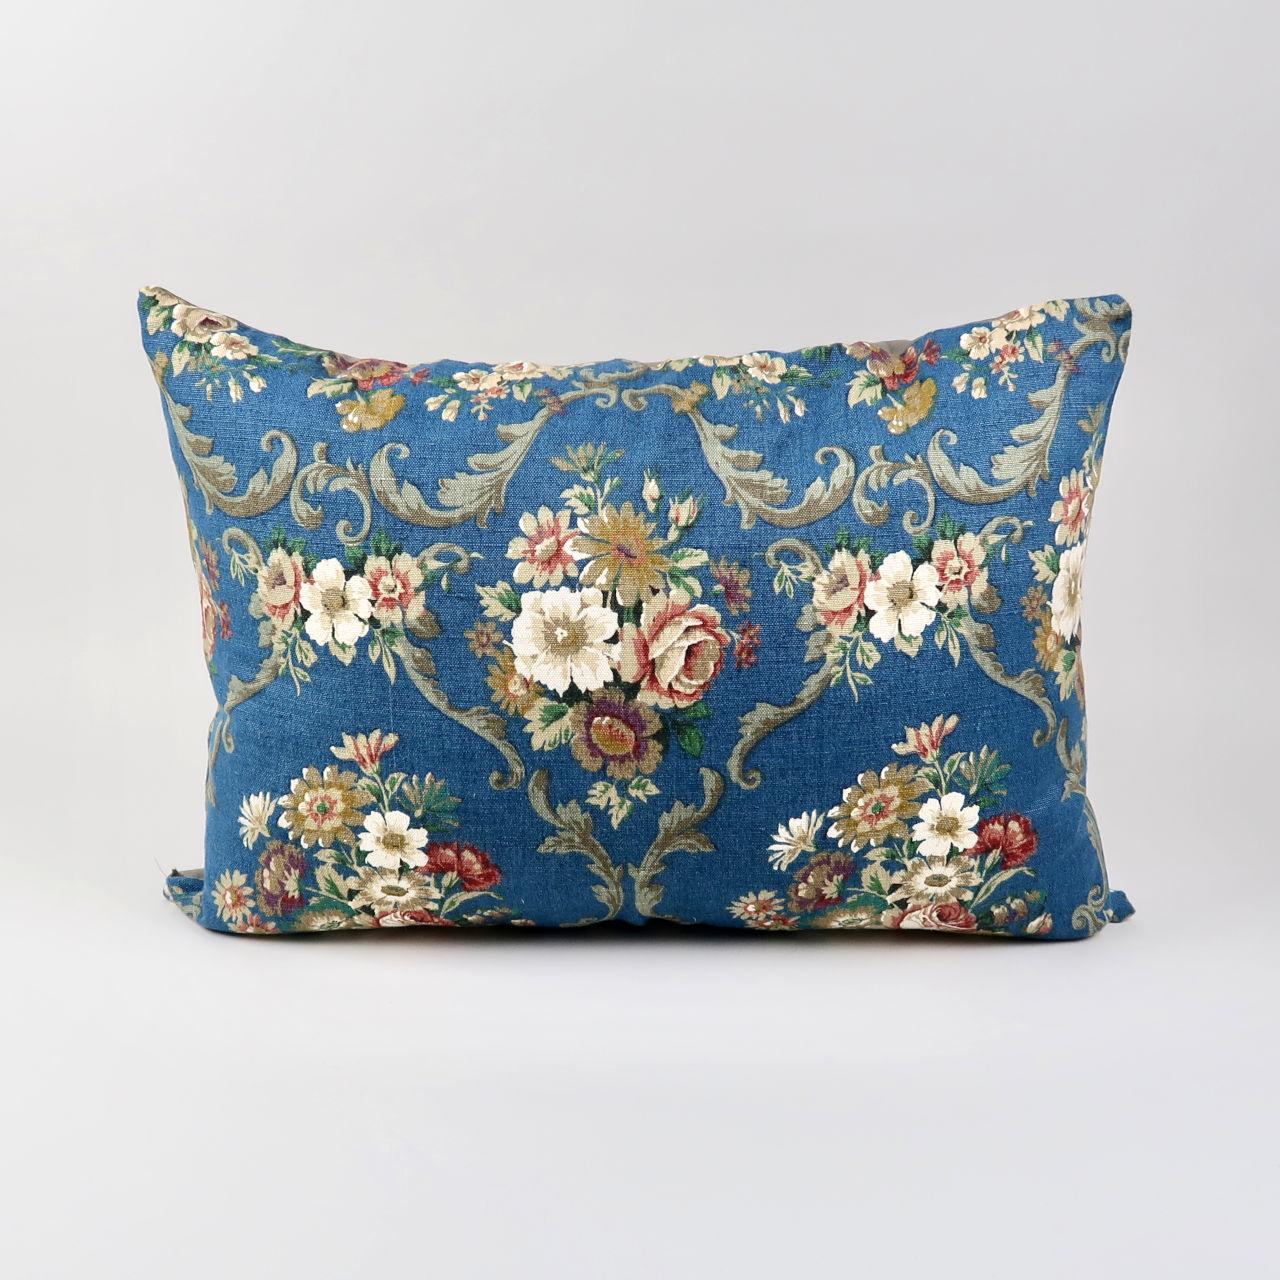 Vintage Sanderson Fabric Cushion